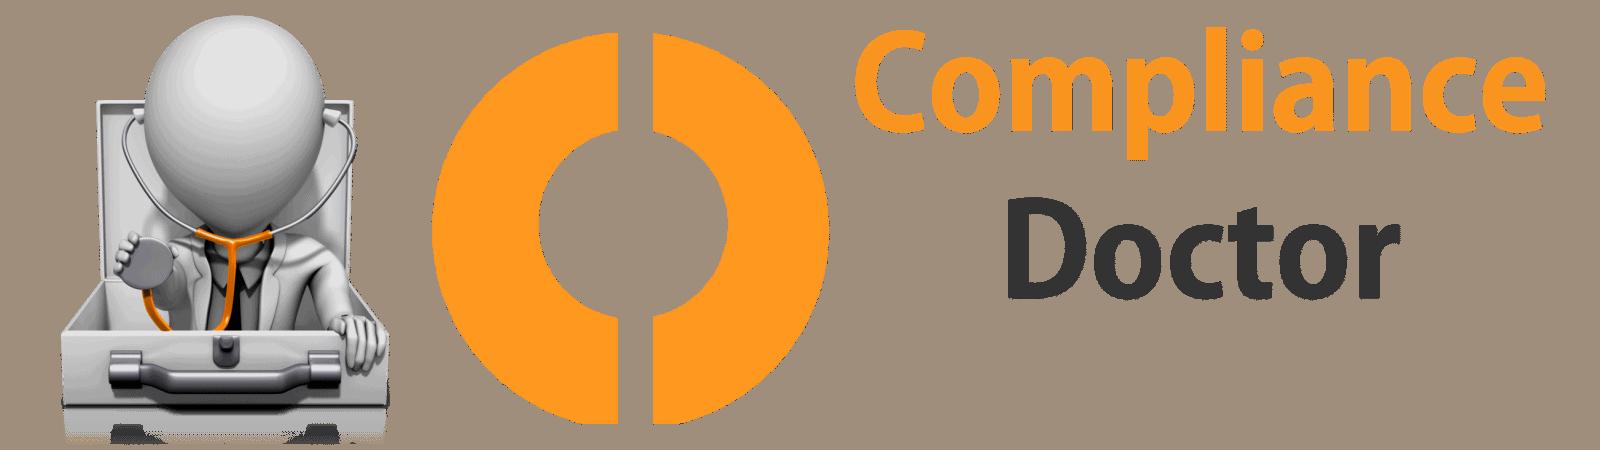 compliants fca handbook compliance doctor management